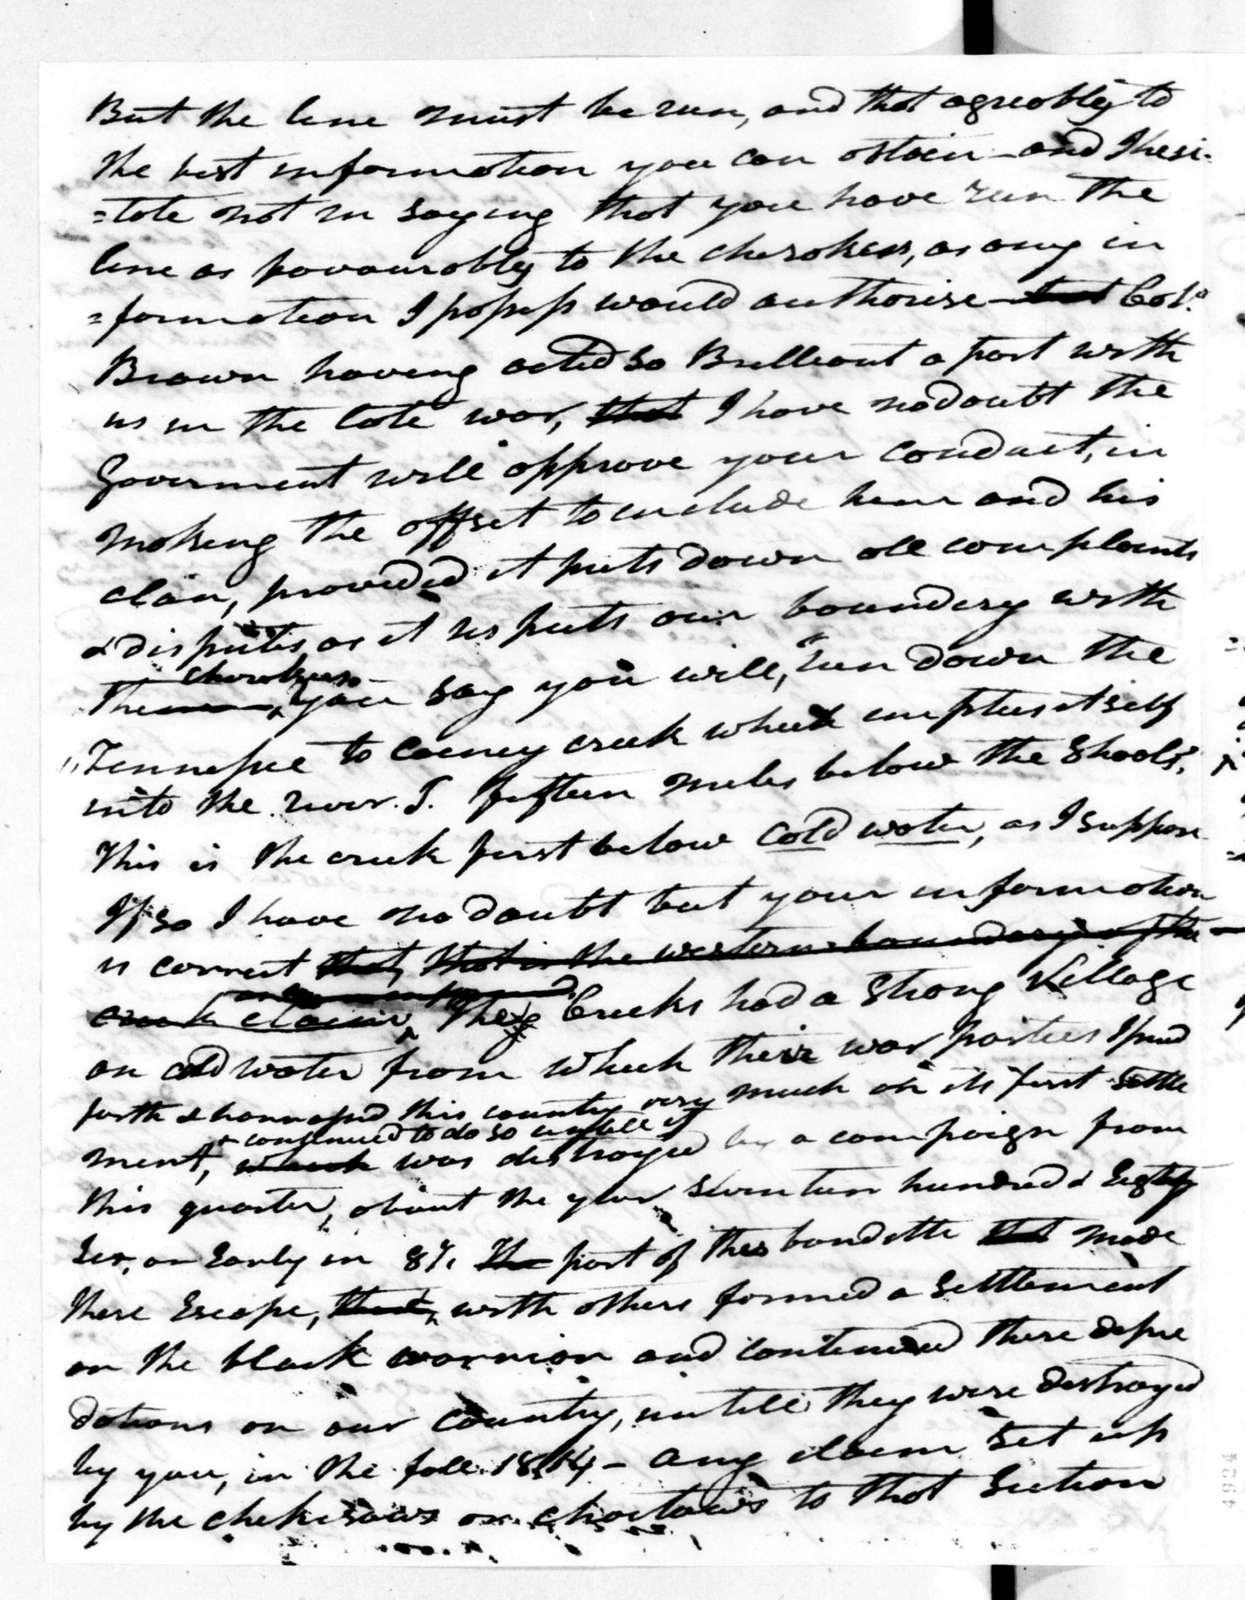 Andrew Jackson to John Coffee, February 13, 1816